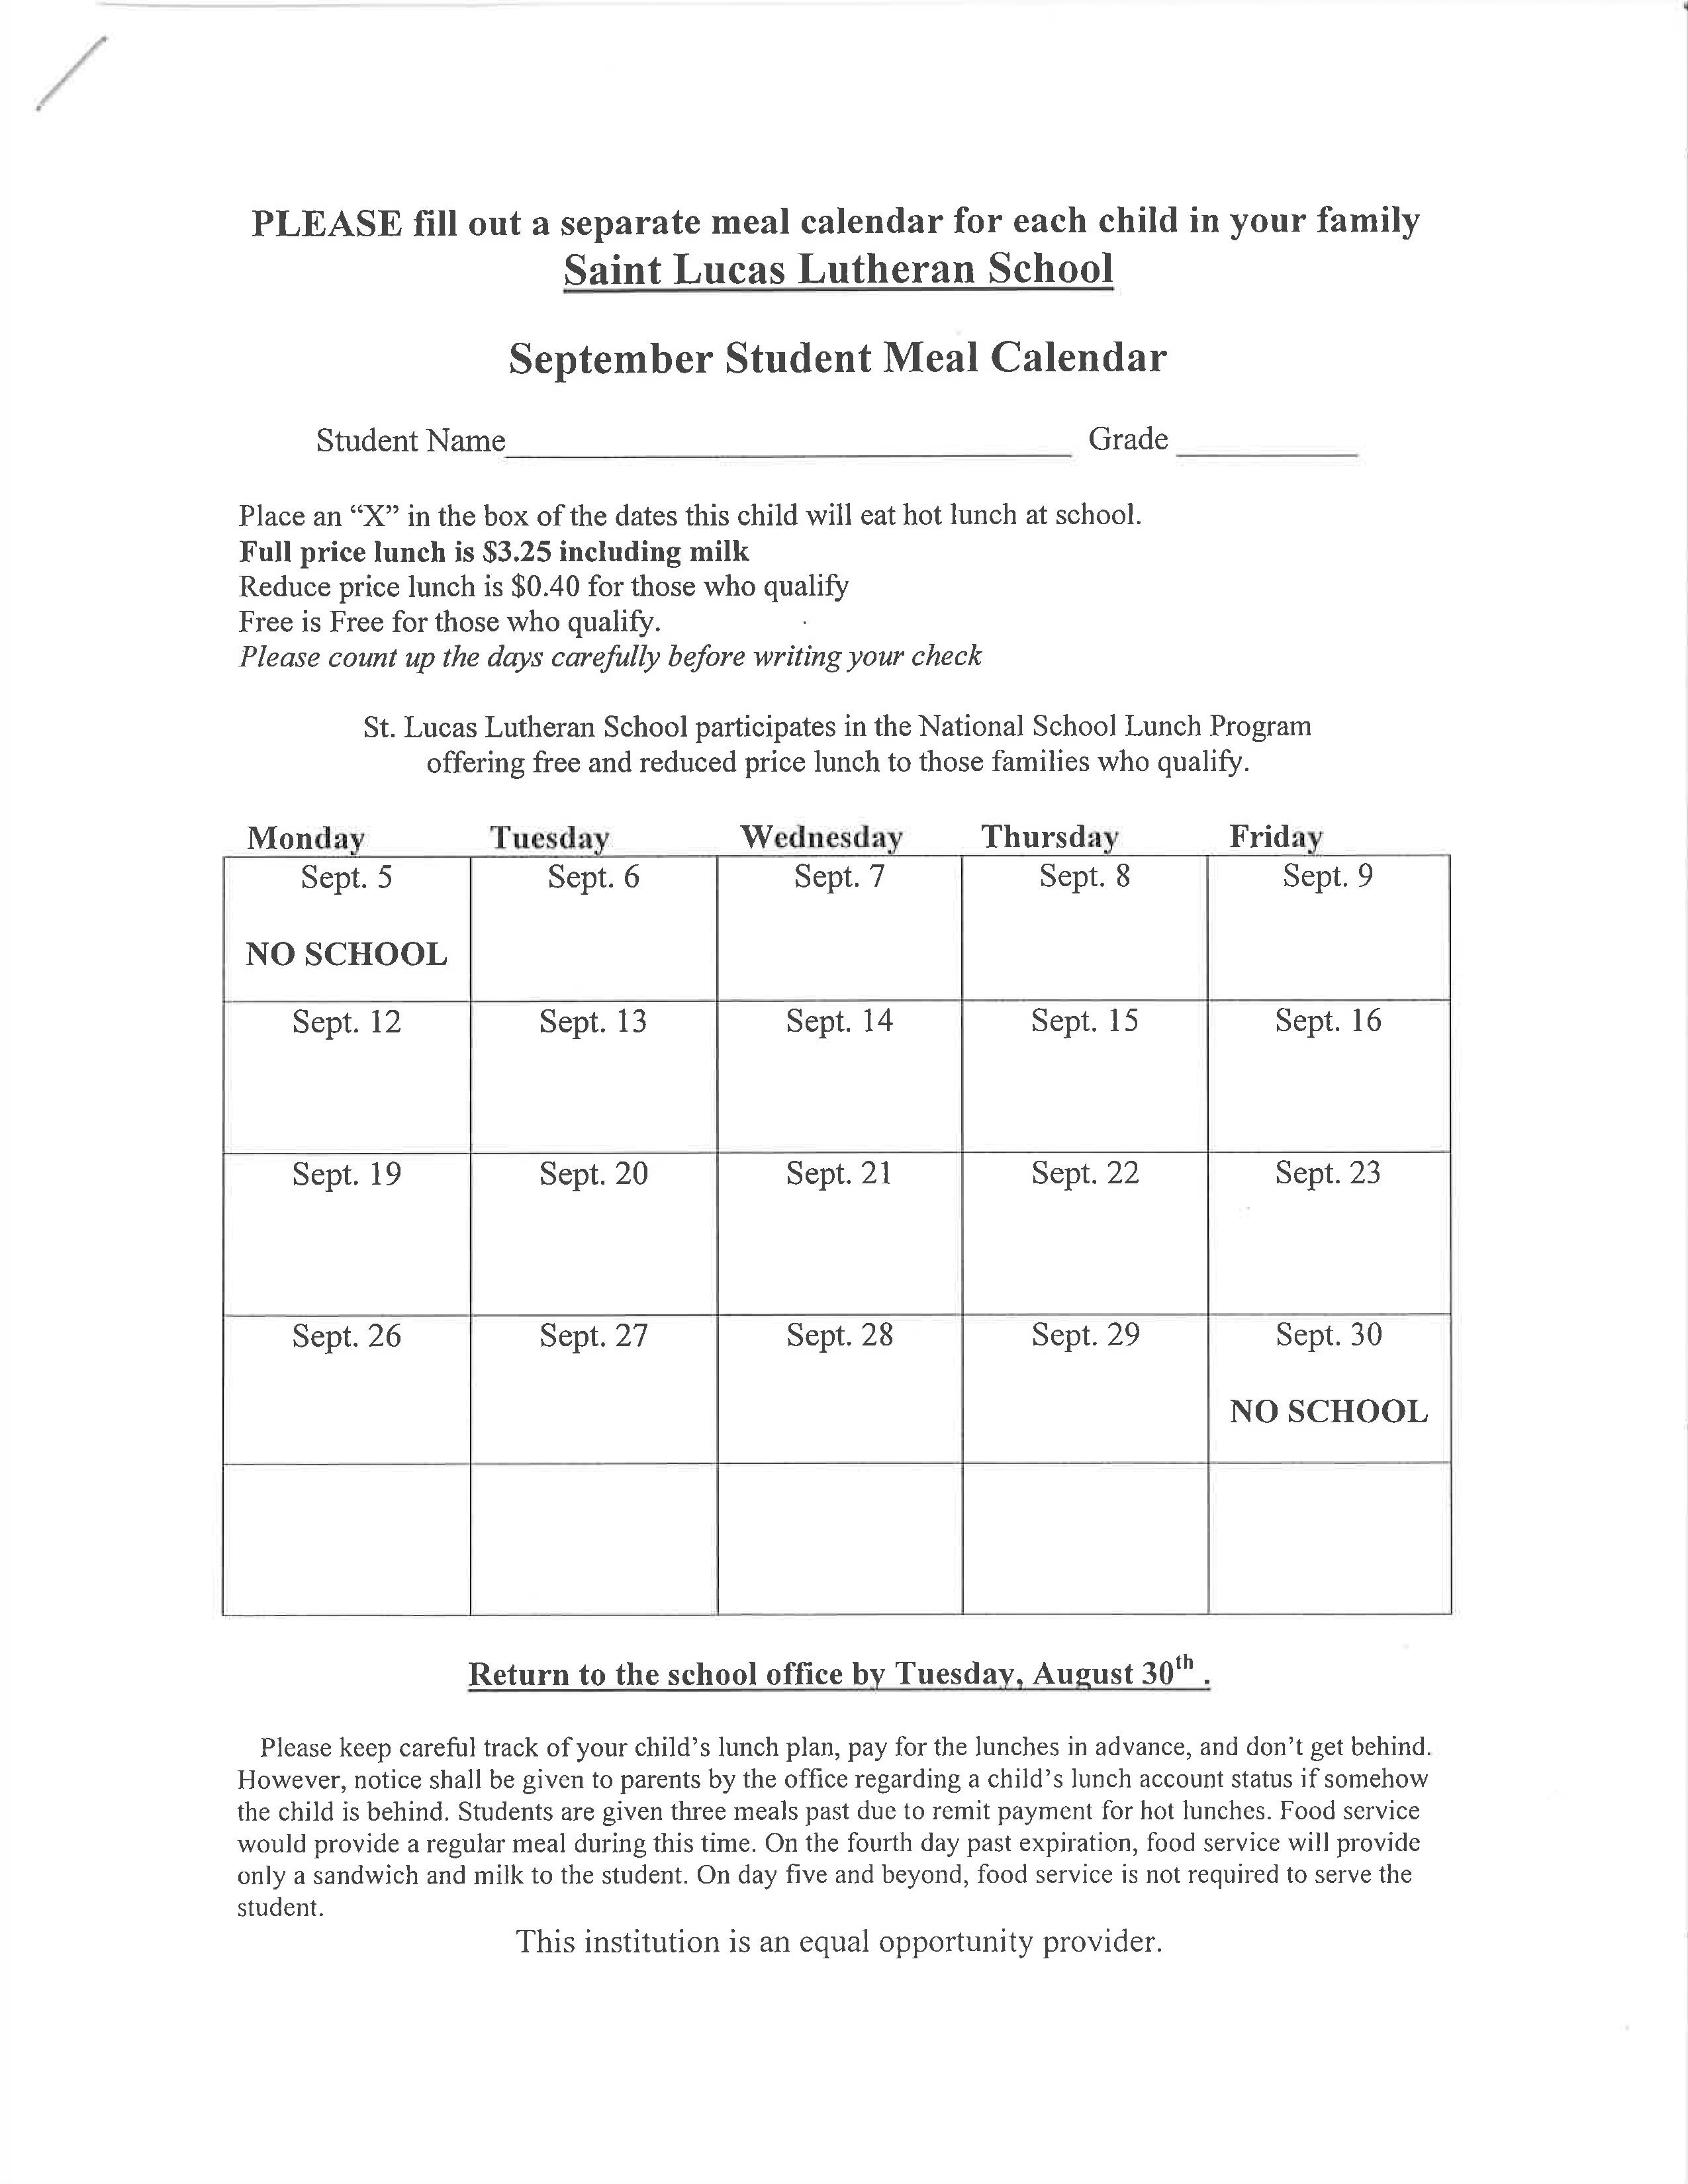 free school meal calendar templates at